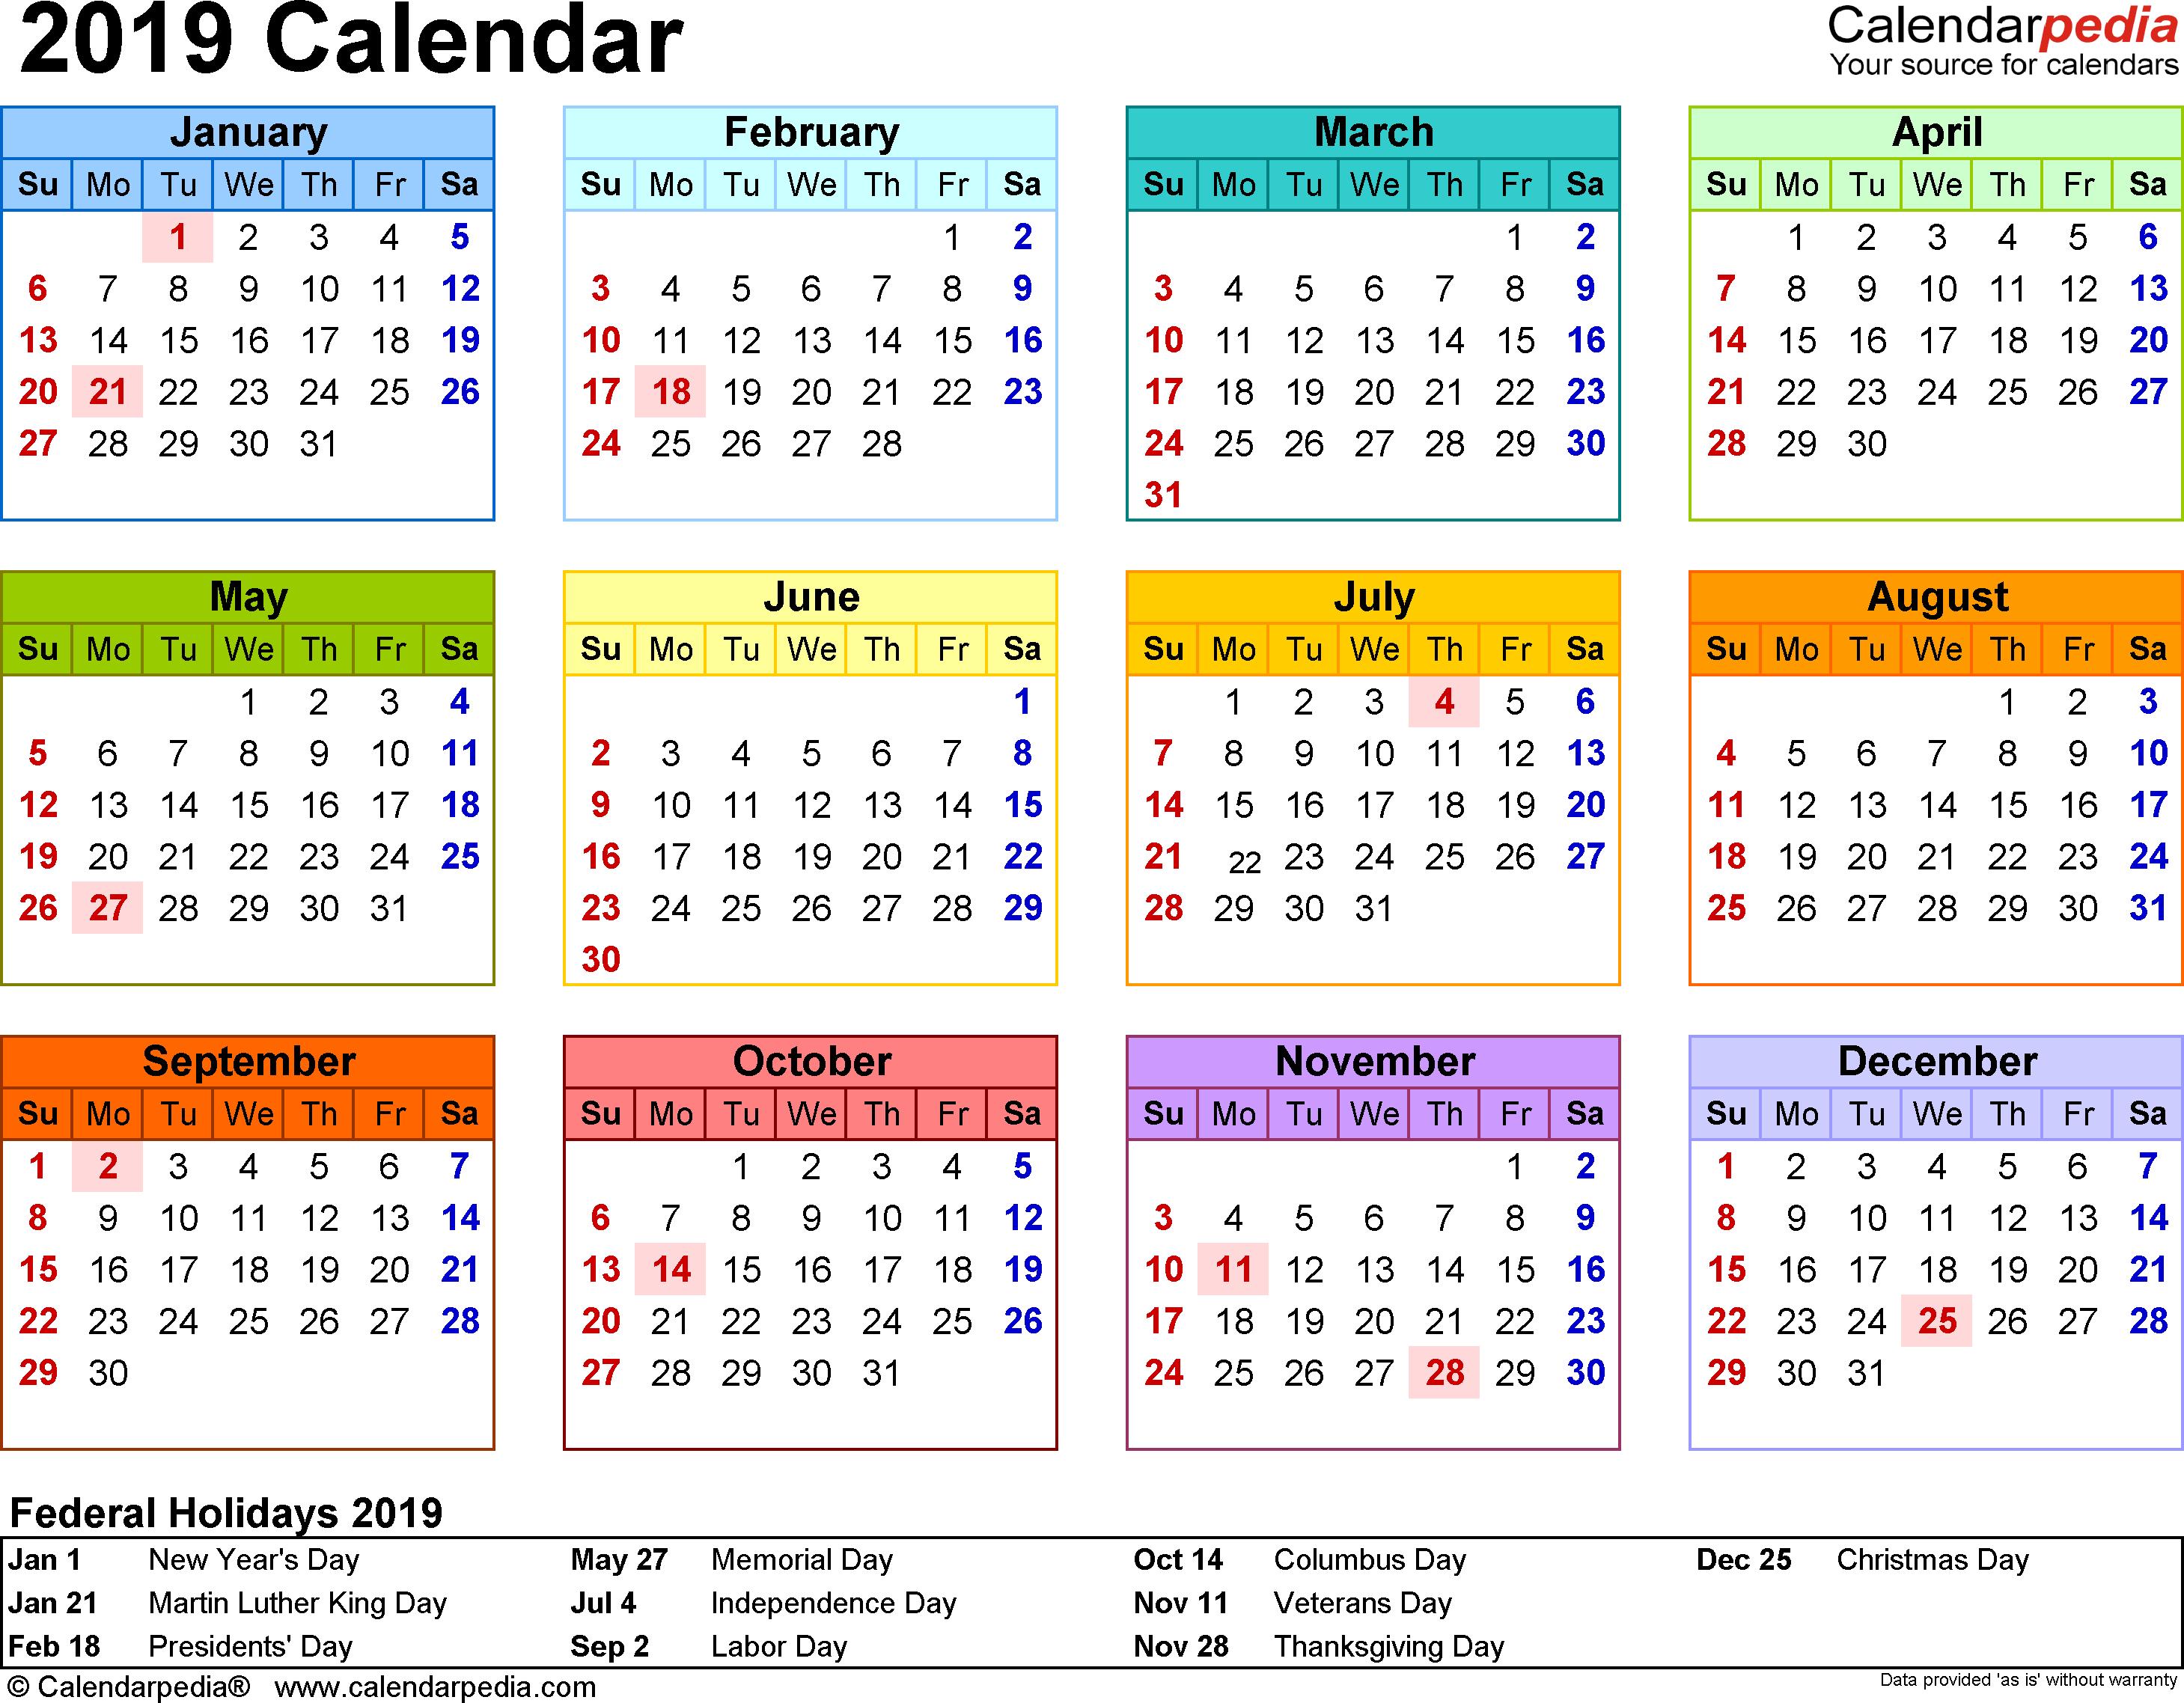 2019 Calendar Template - Free Printable Calendar, Templates And Holidays Calendar 2019 With Holidays Printable